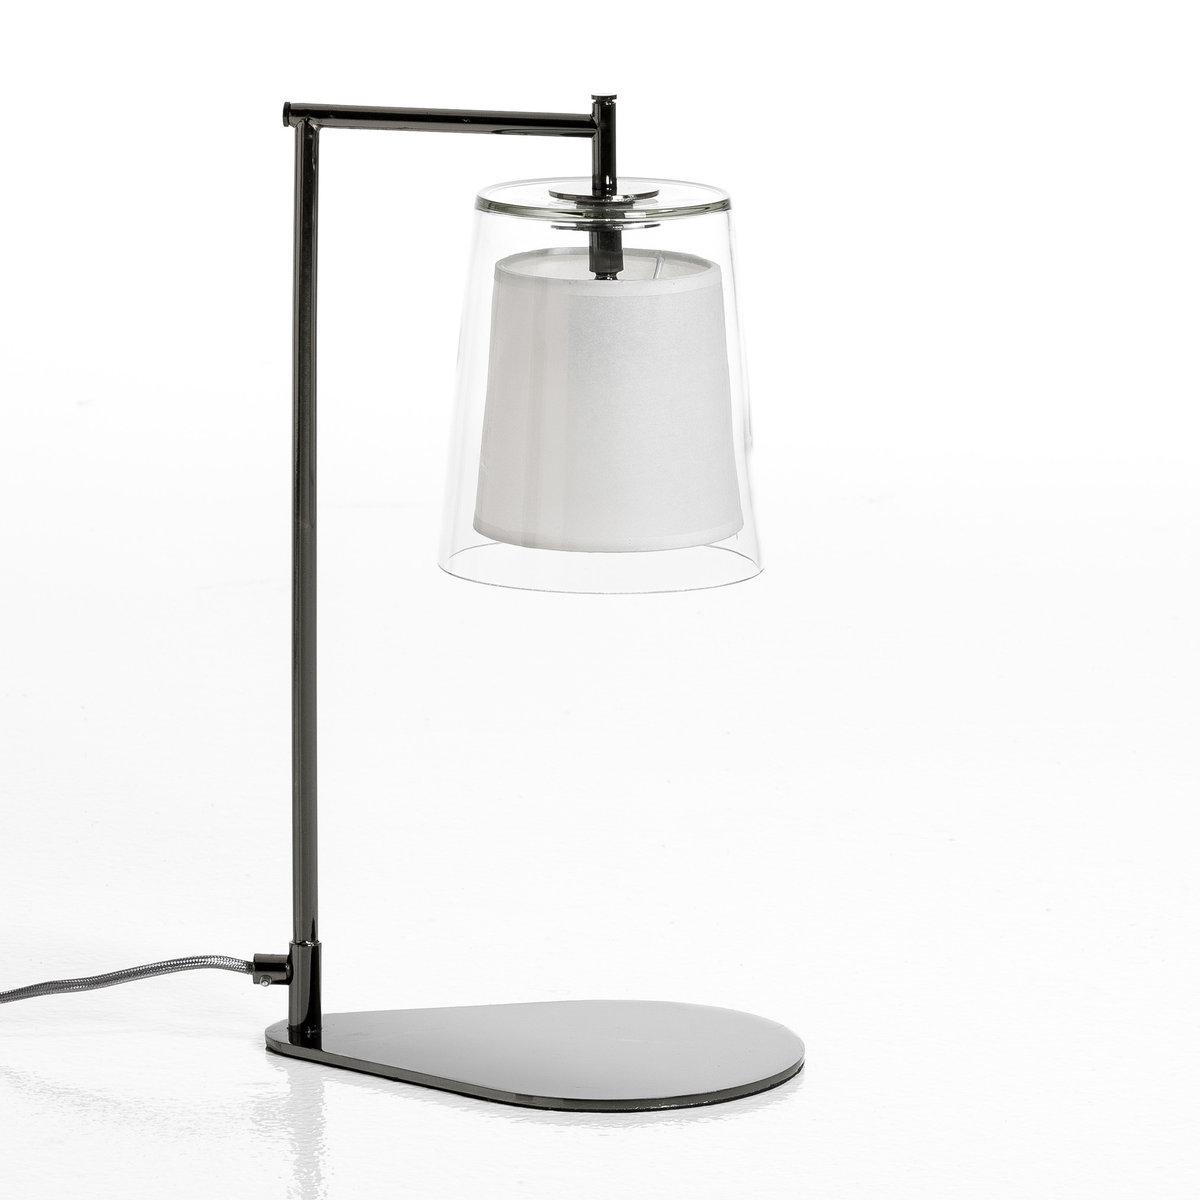 Лампа настольная Duo дизайн Э. Галлины от La Redoute